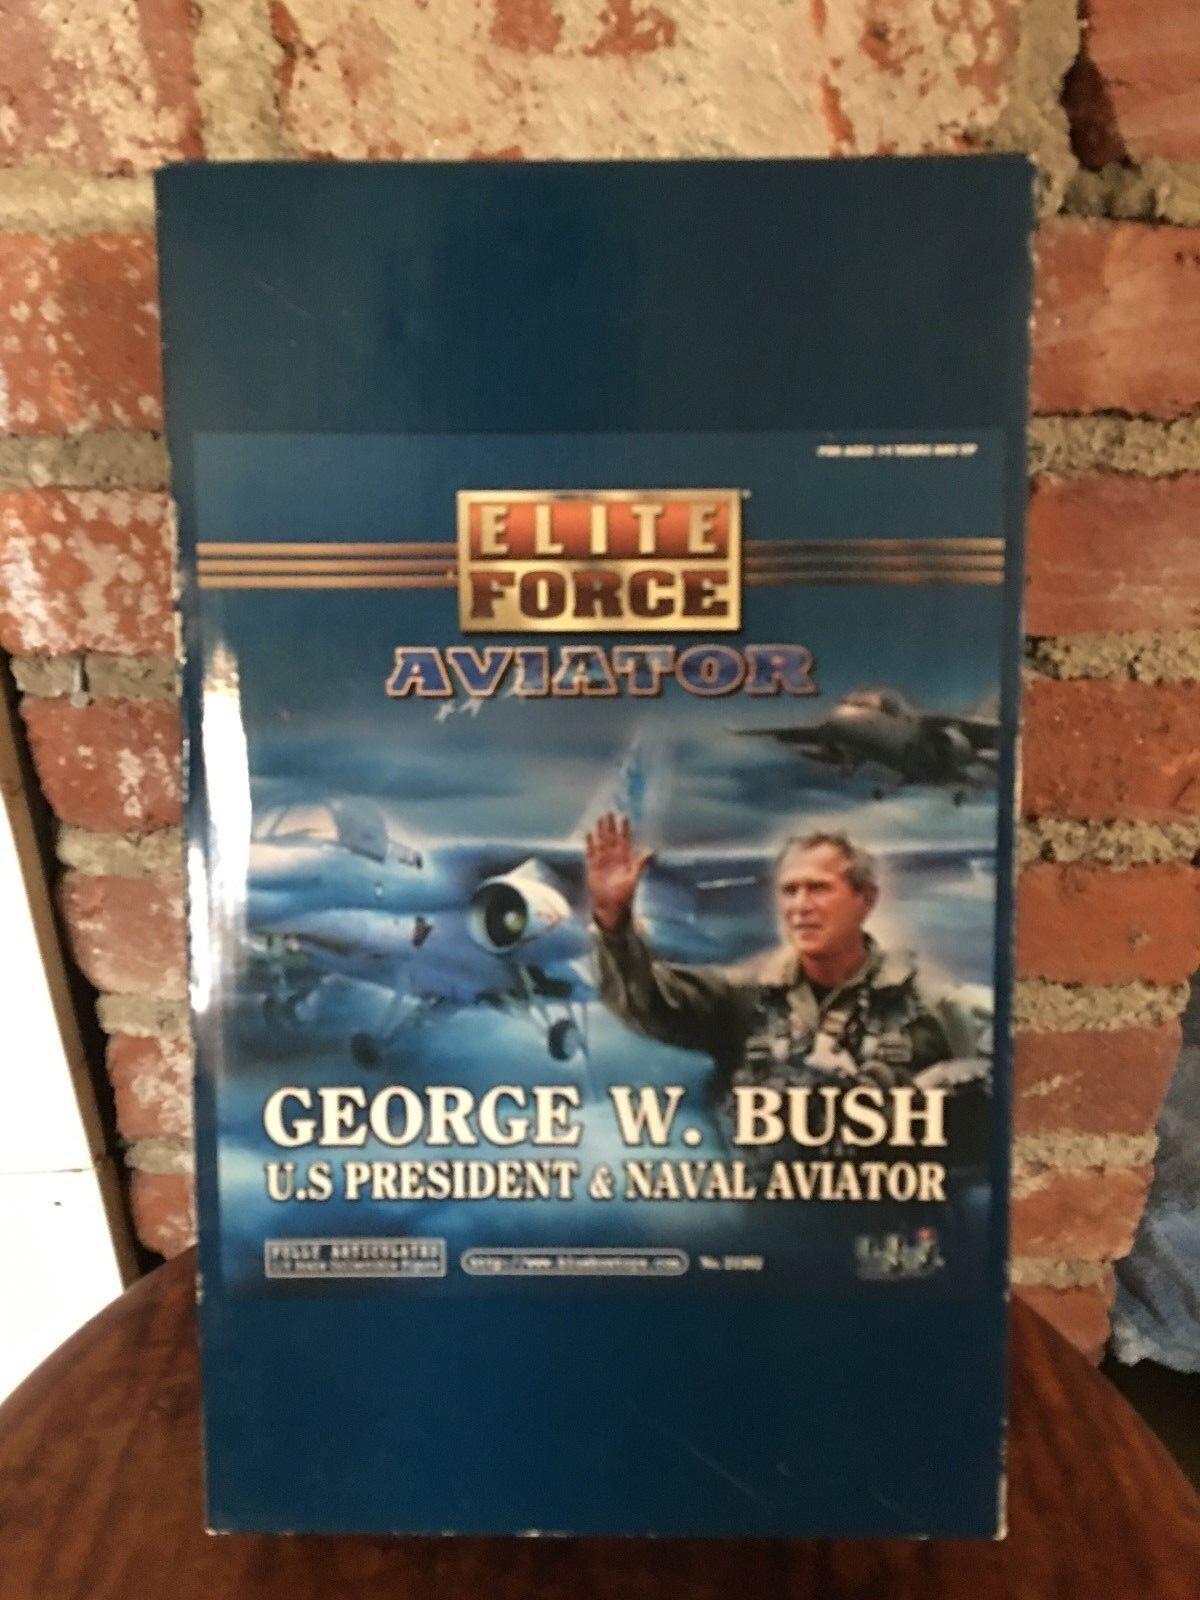 Blu Box Toys Elite Force Aviator George W. Bush U.S. President & Naval Aviator